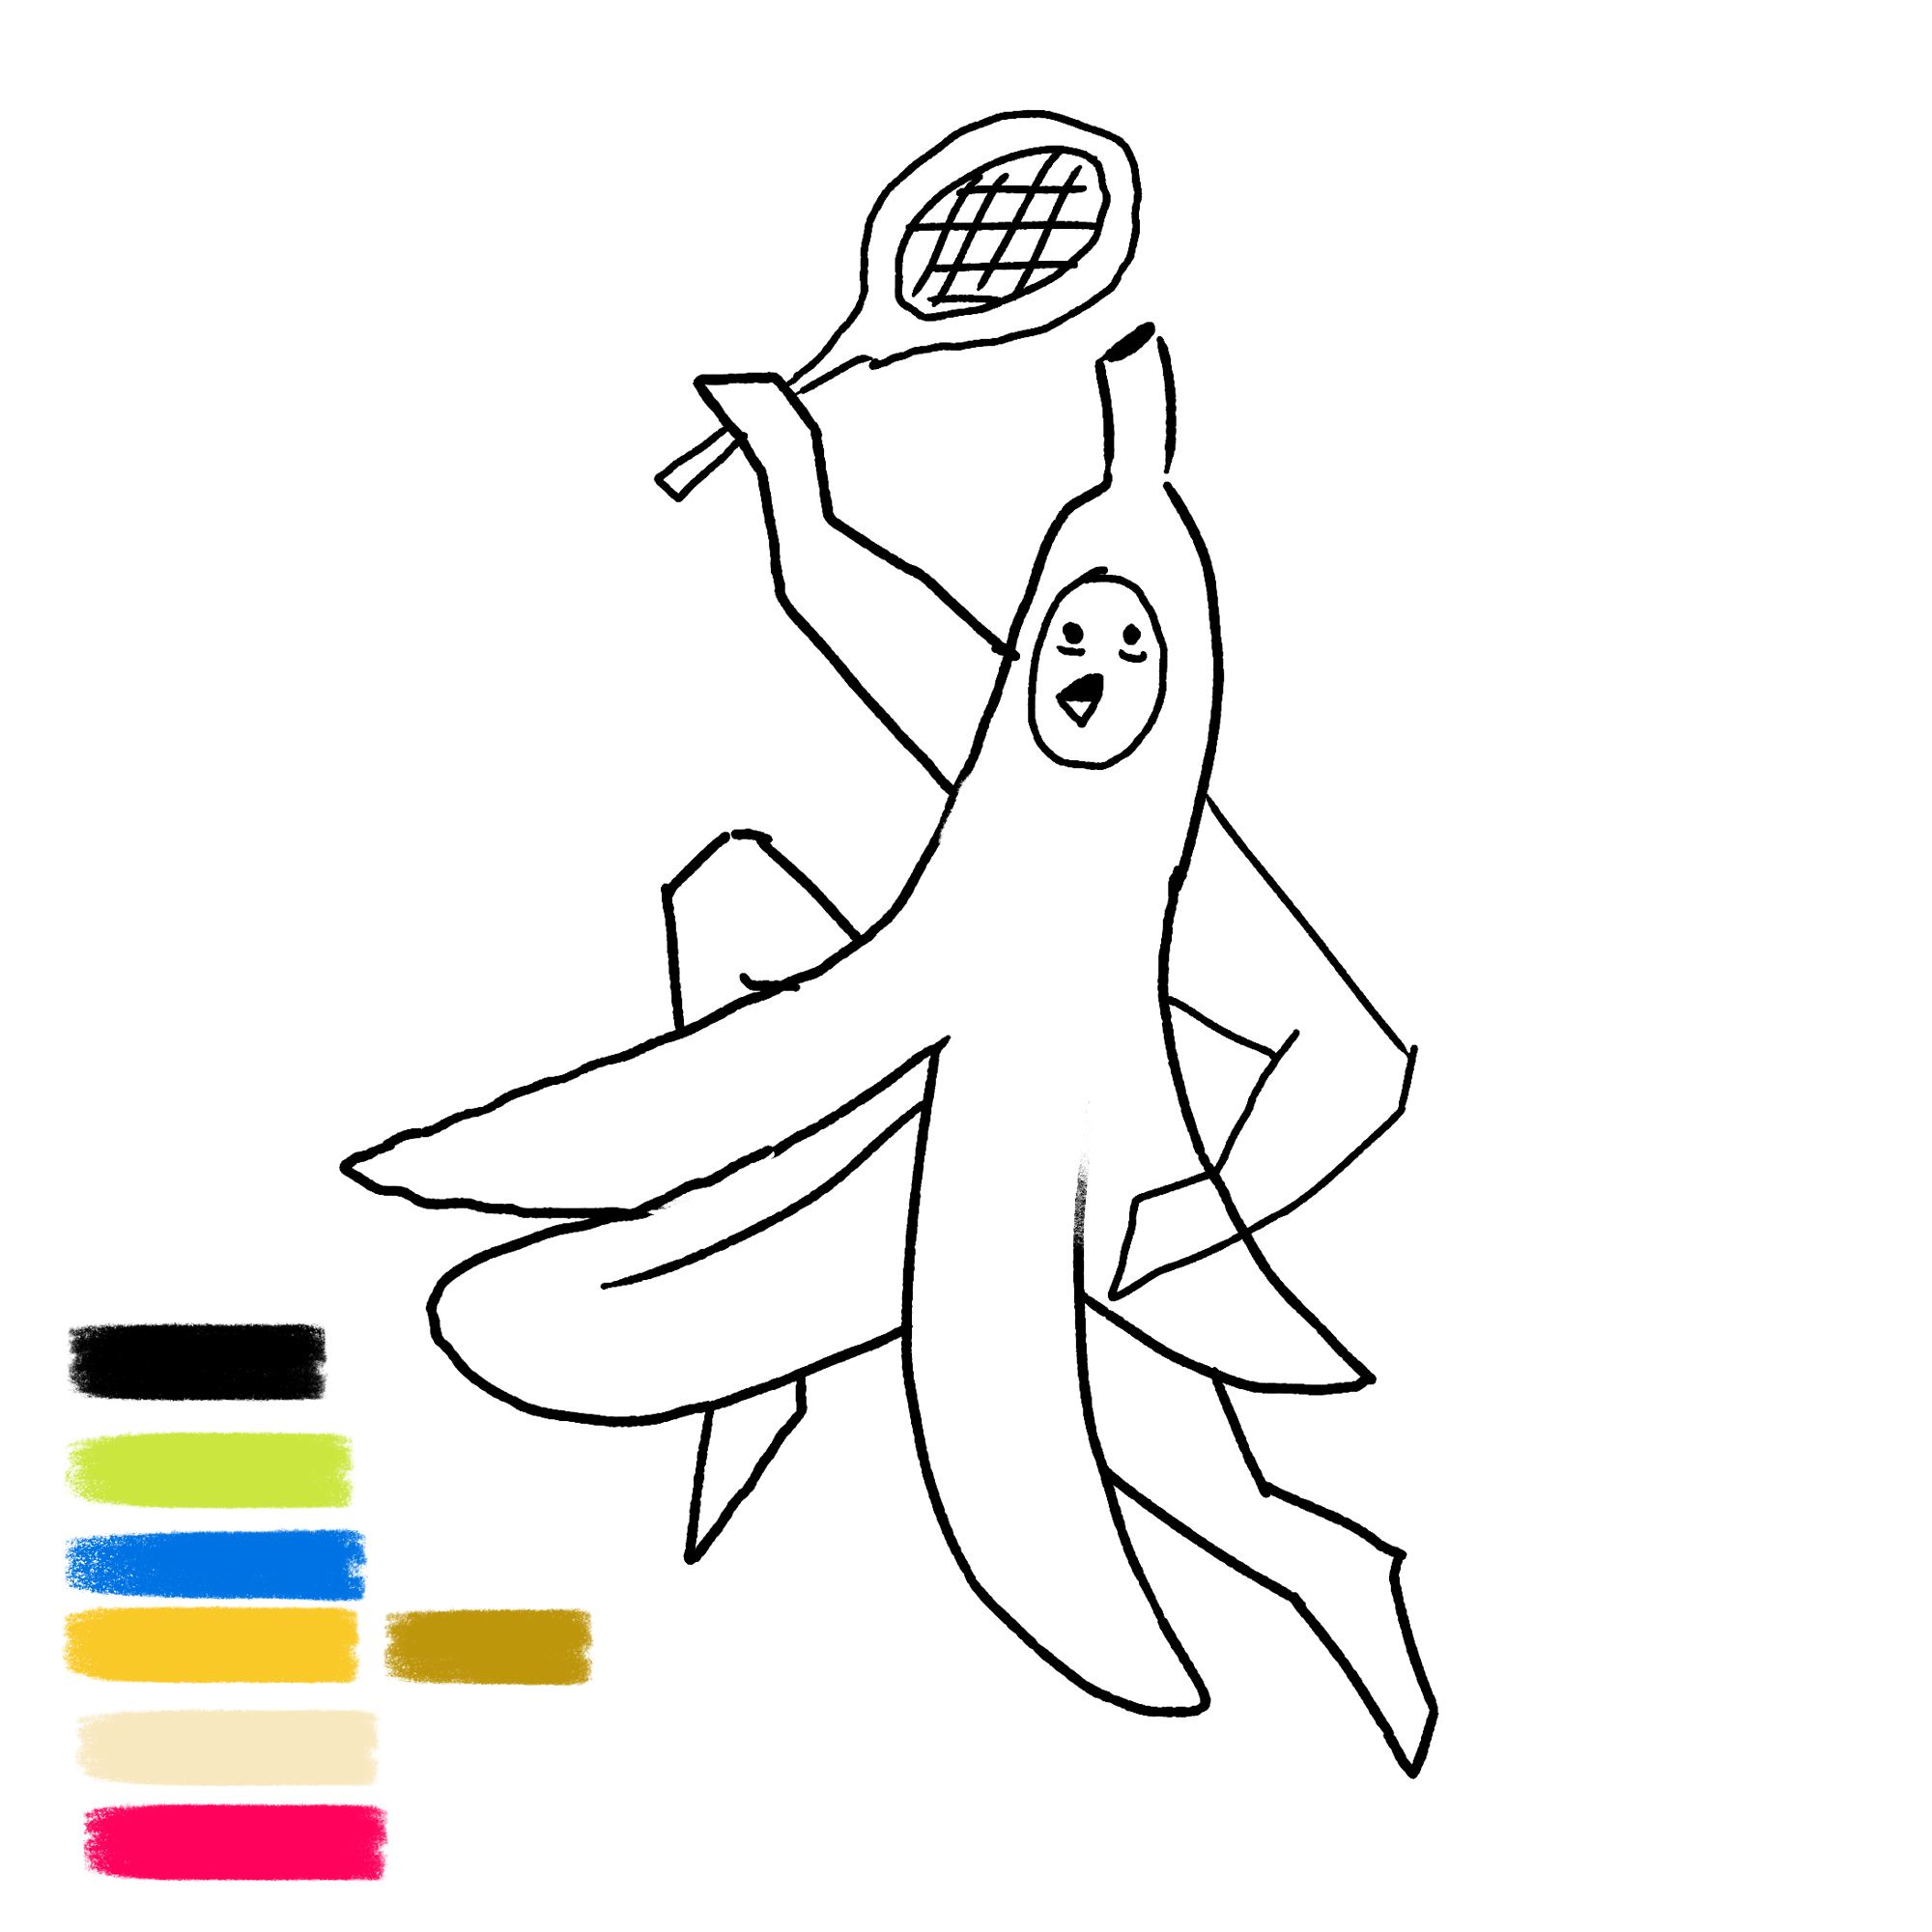 banana-guy_raff